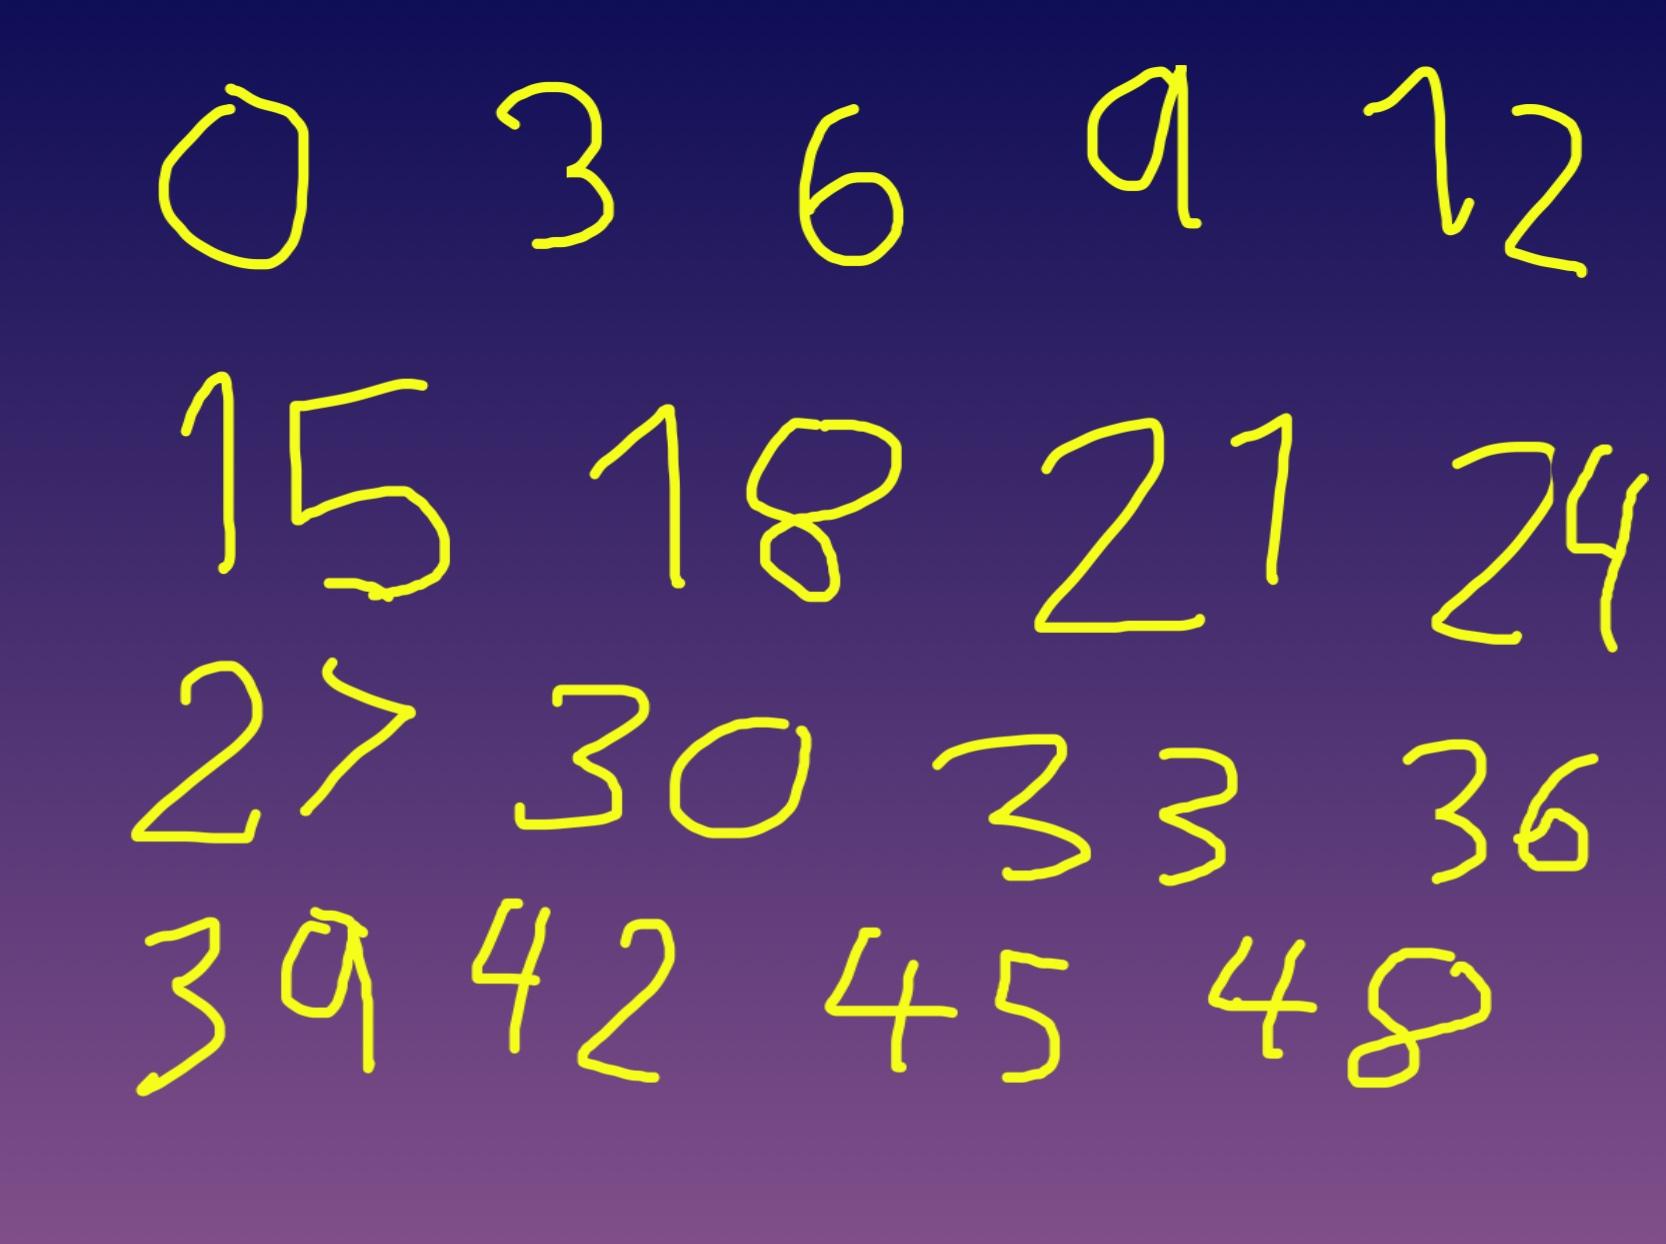 3d856b2f-0142-49f6-9b40-ef2182d5ea69.jpg___1610036470___7776000___eONtUYfMk2nhg6qwDl-f3qVBHfqCZuAs65JHq5S1HCqR9rcQ8tb9GgU-7Mmg0ZemZvsqJKsKwXRVwSYuWvaTeg